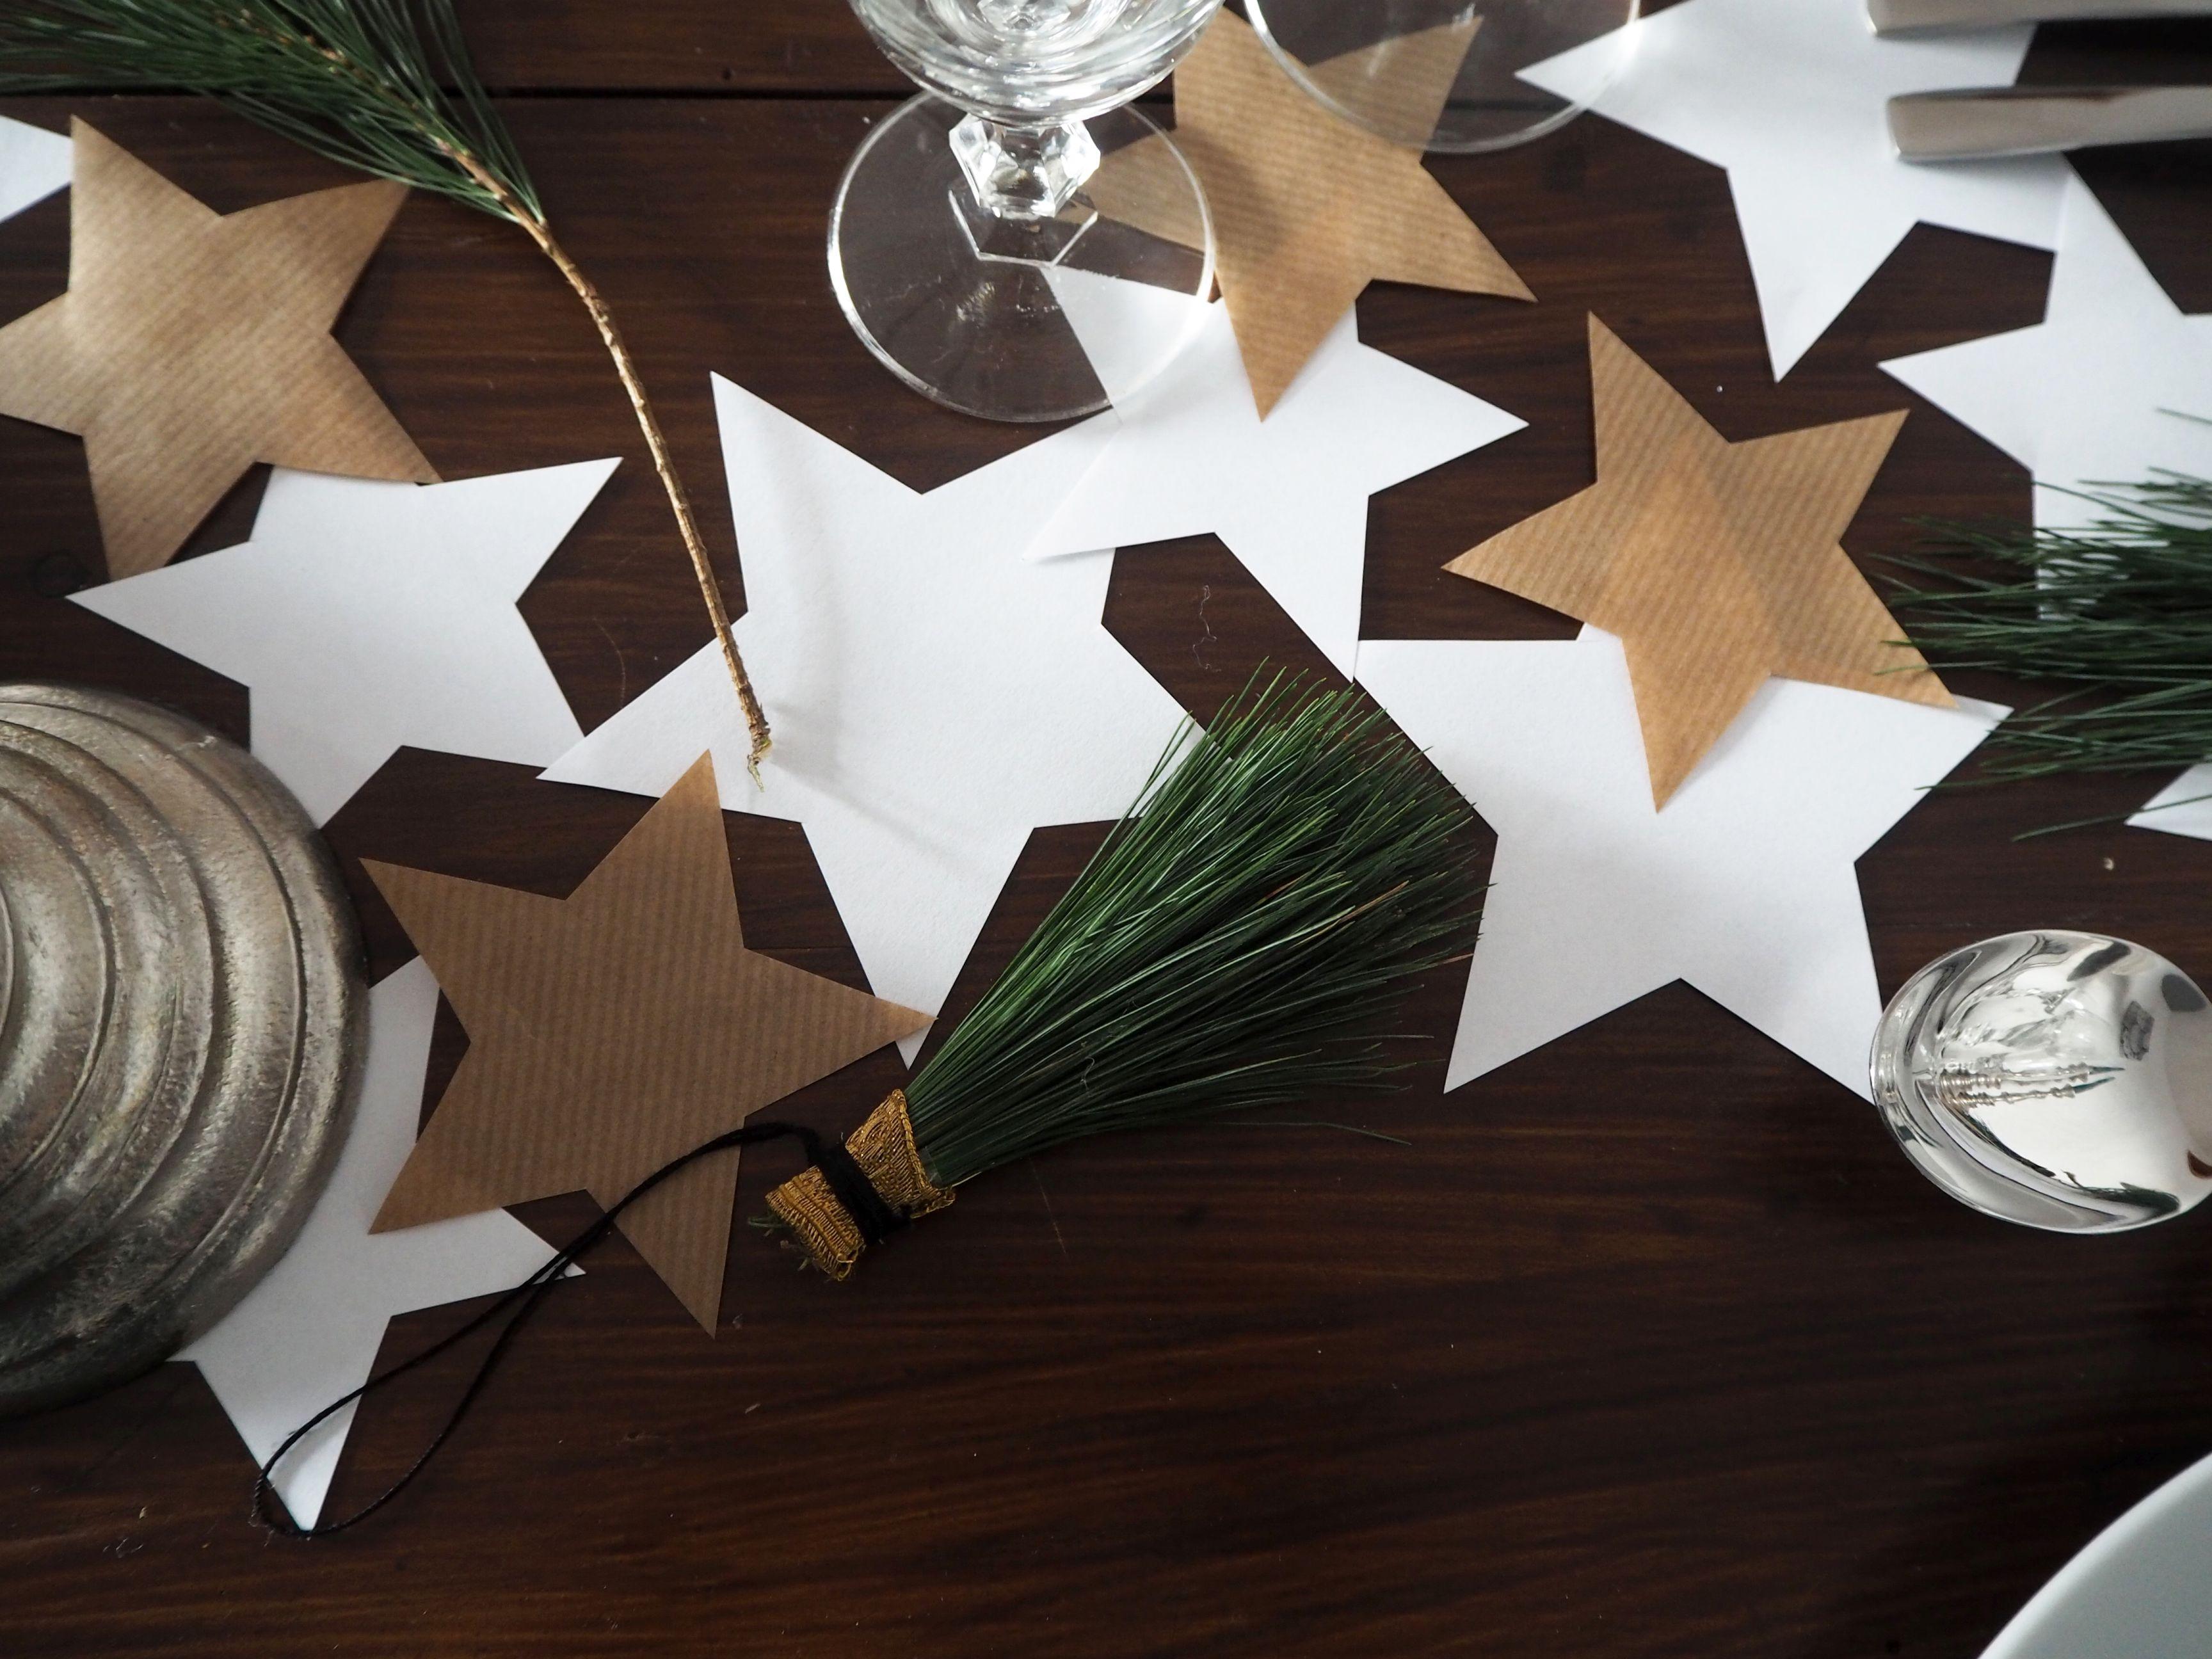 2016-12-skoen-och-kreativ-tischdeko-sternenhimmel-fuer-den-silvestertisch (4)